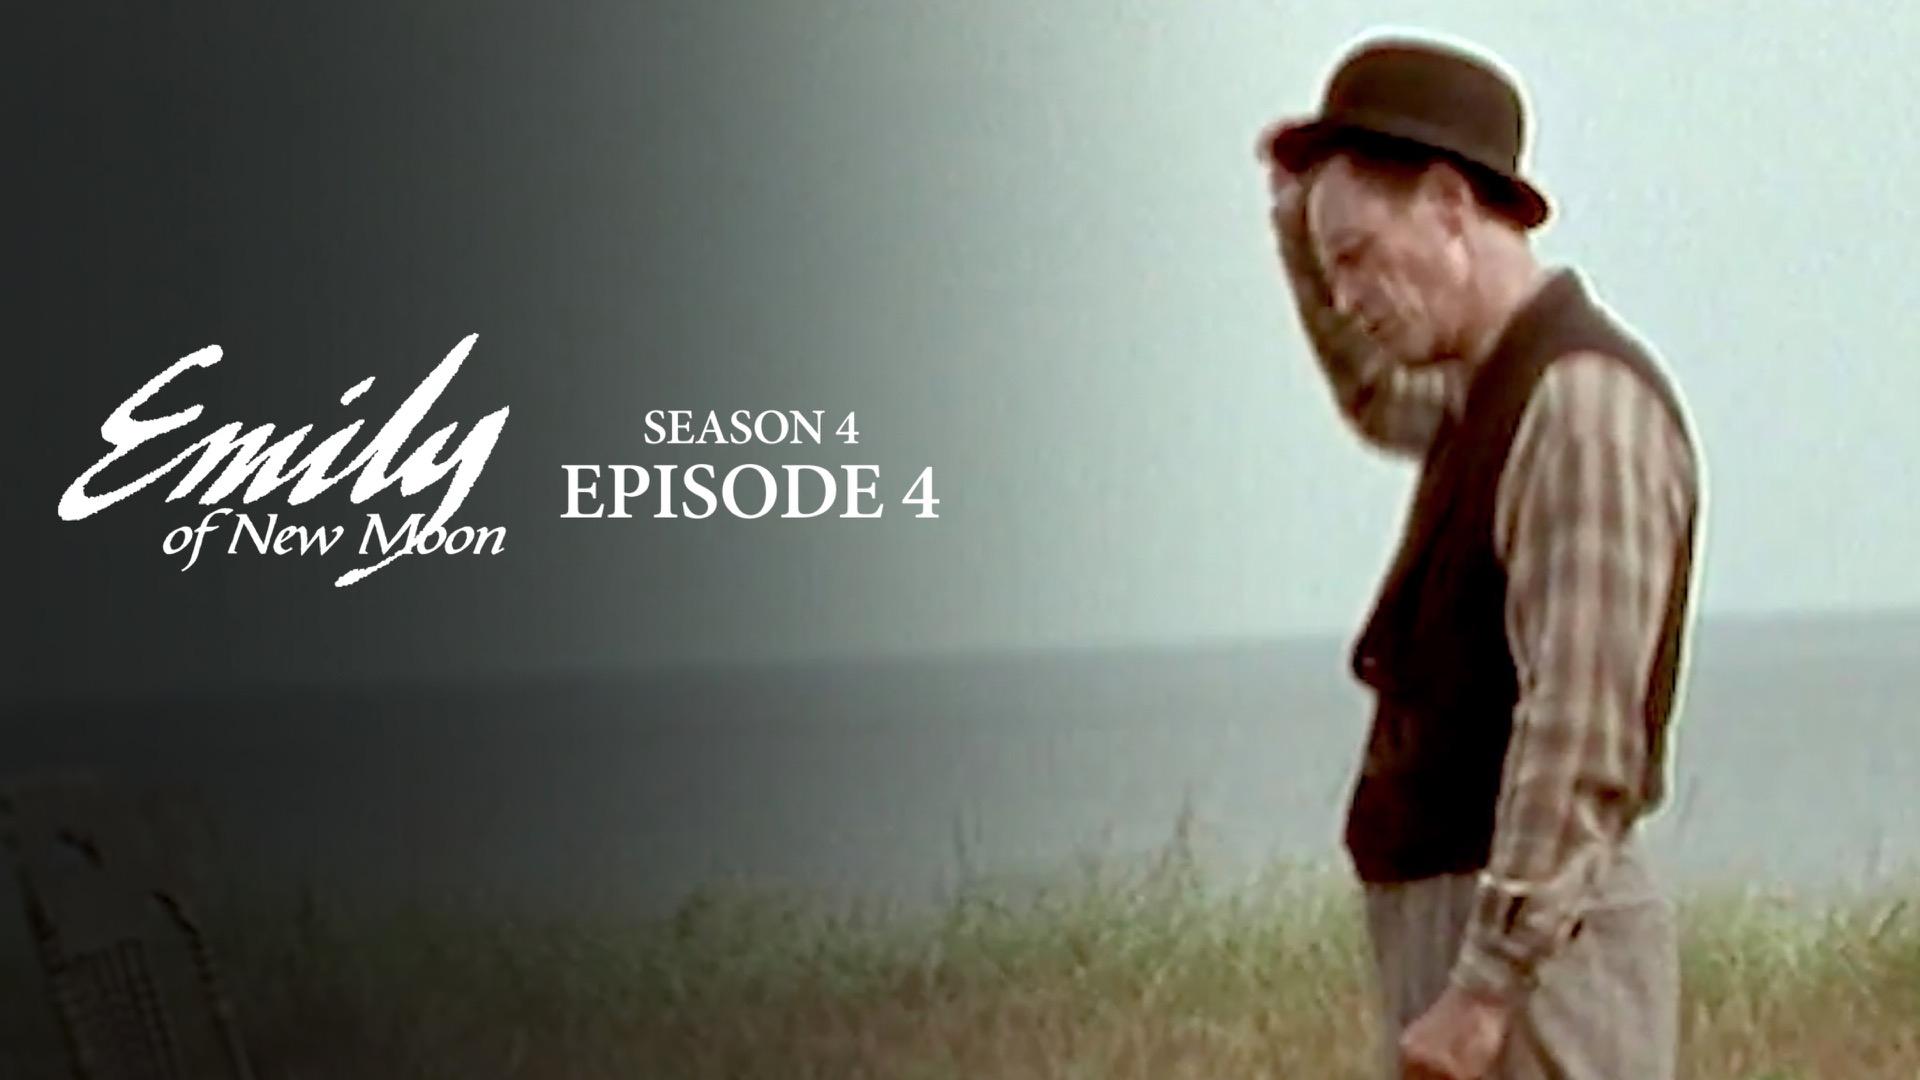 Emily of New Moon Season 4 Episode 4